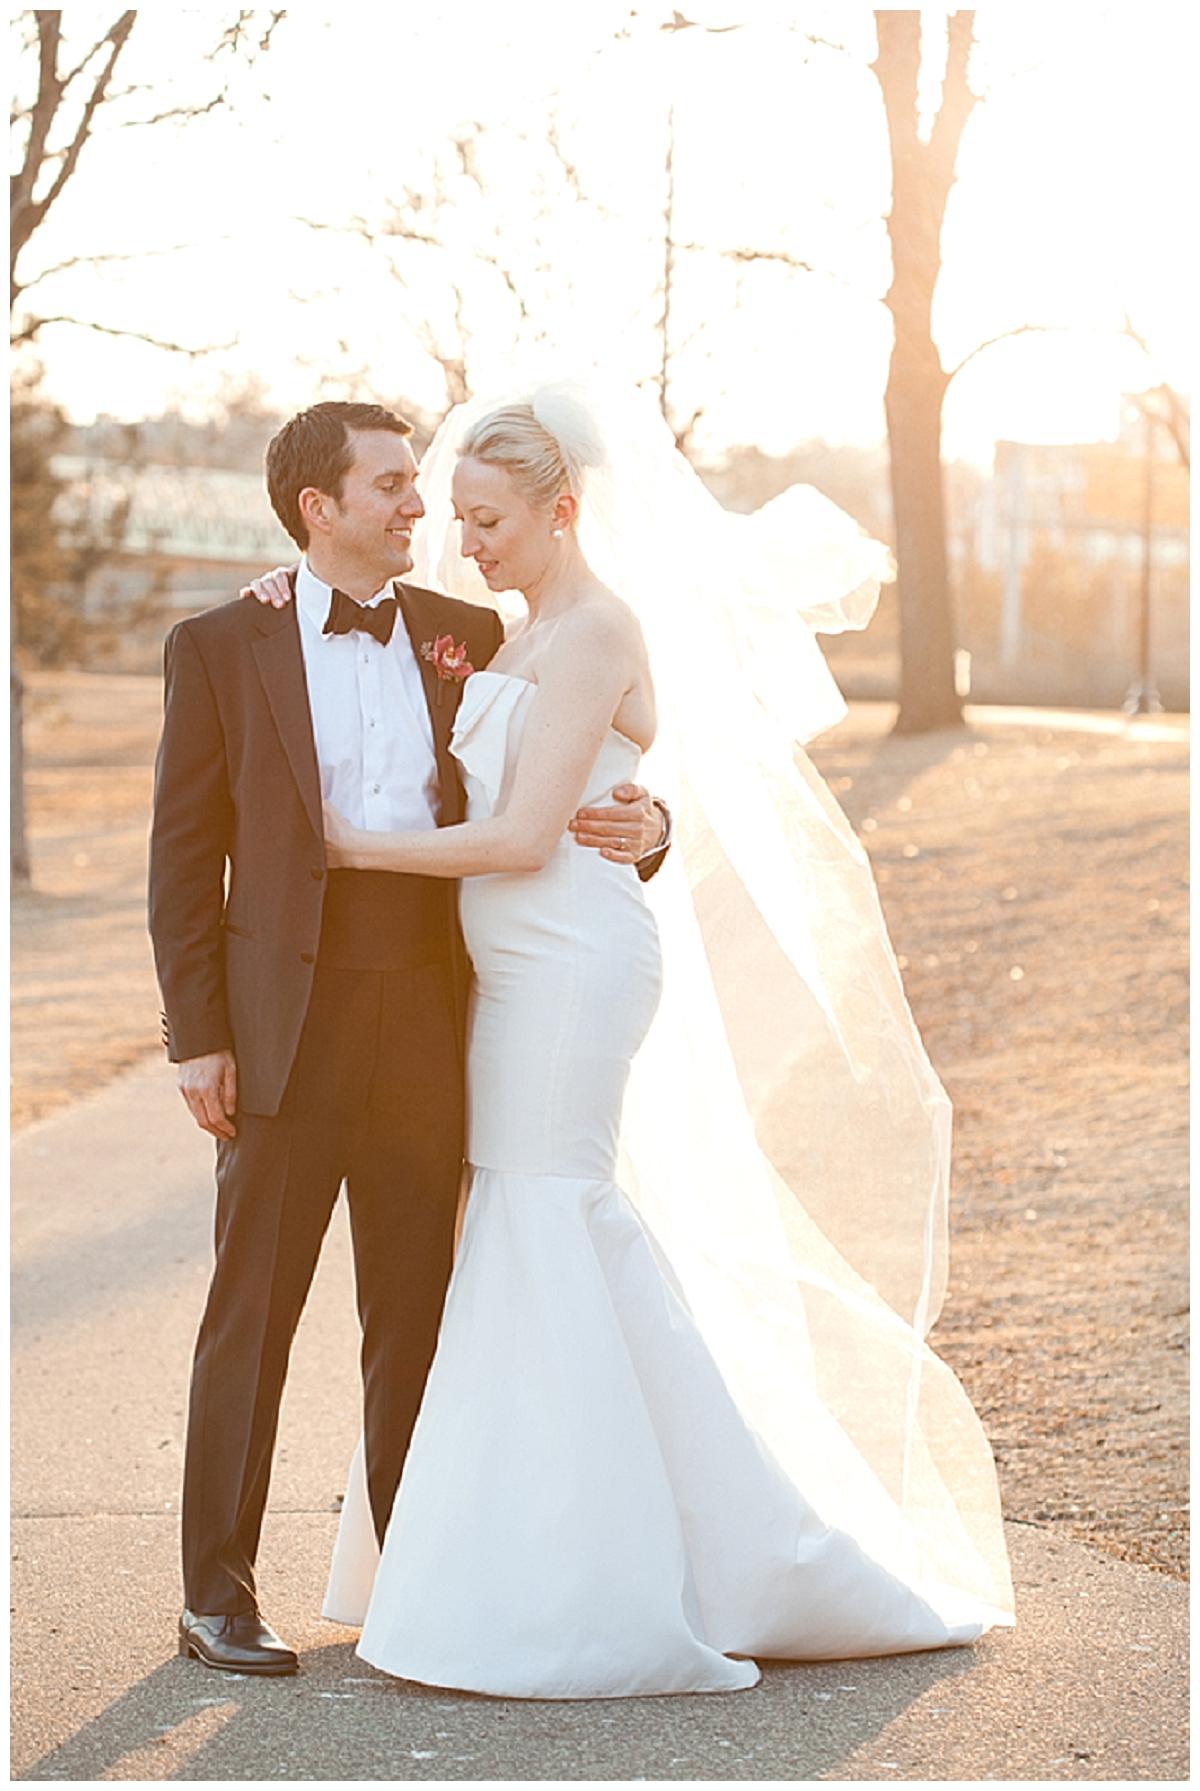 Black, white & ivory: elegant winter | real wedding